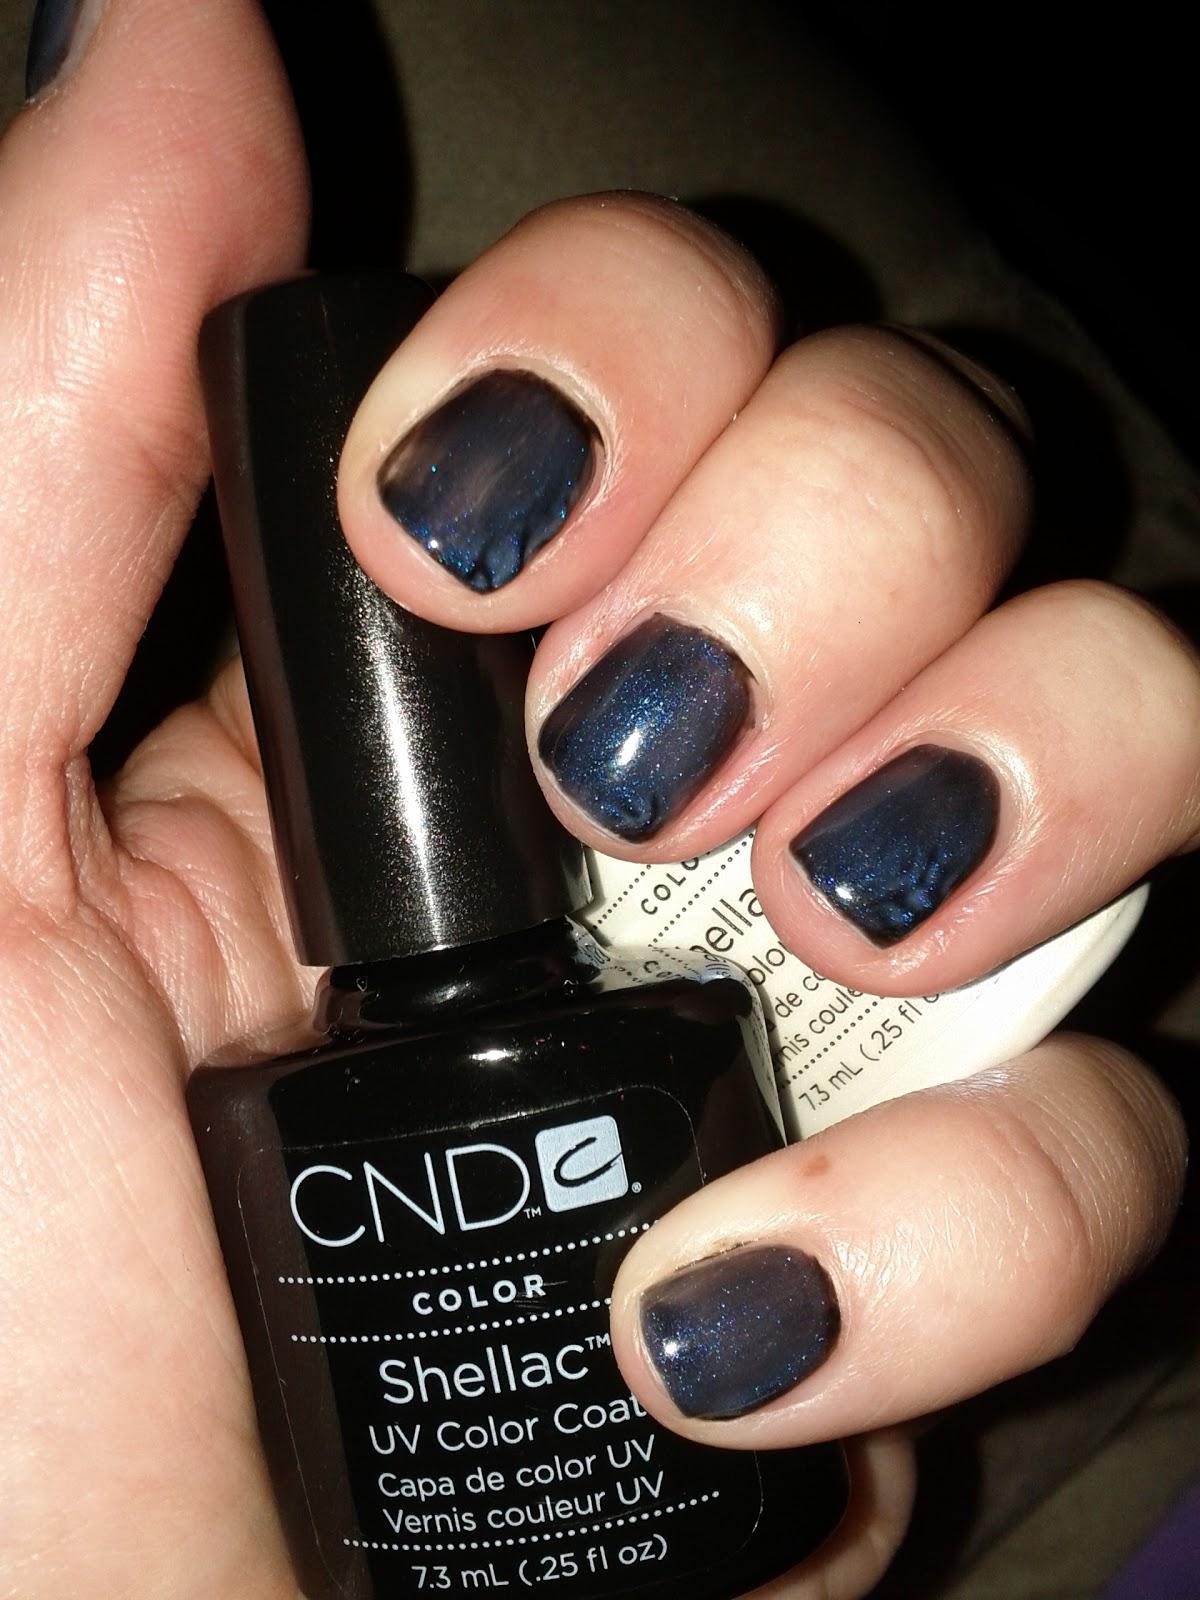 Lipgloss Break: nail polish